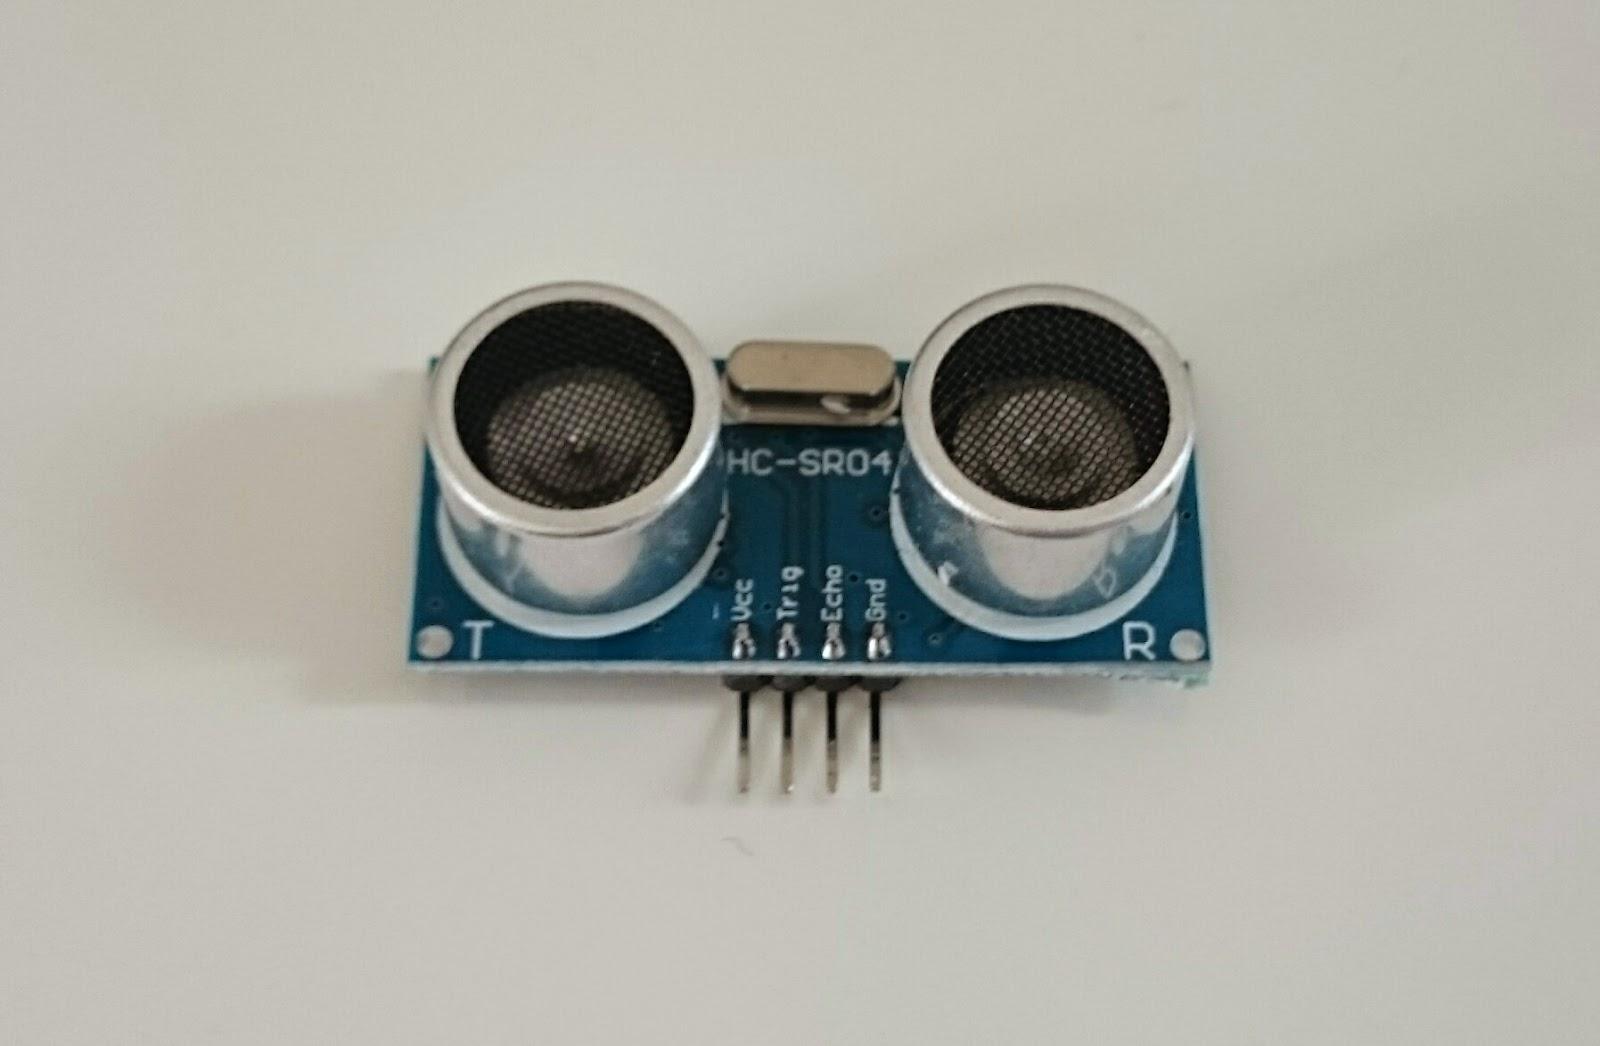 michaelsarduino entfernung messen mit einem ultraschallsensor. Black Bedroom Furniture Sets. Home Design Ideas